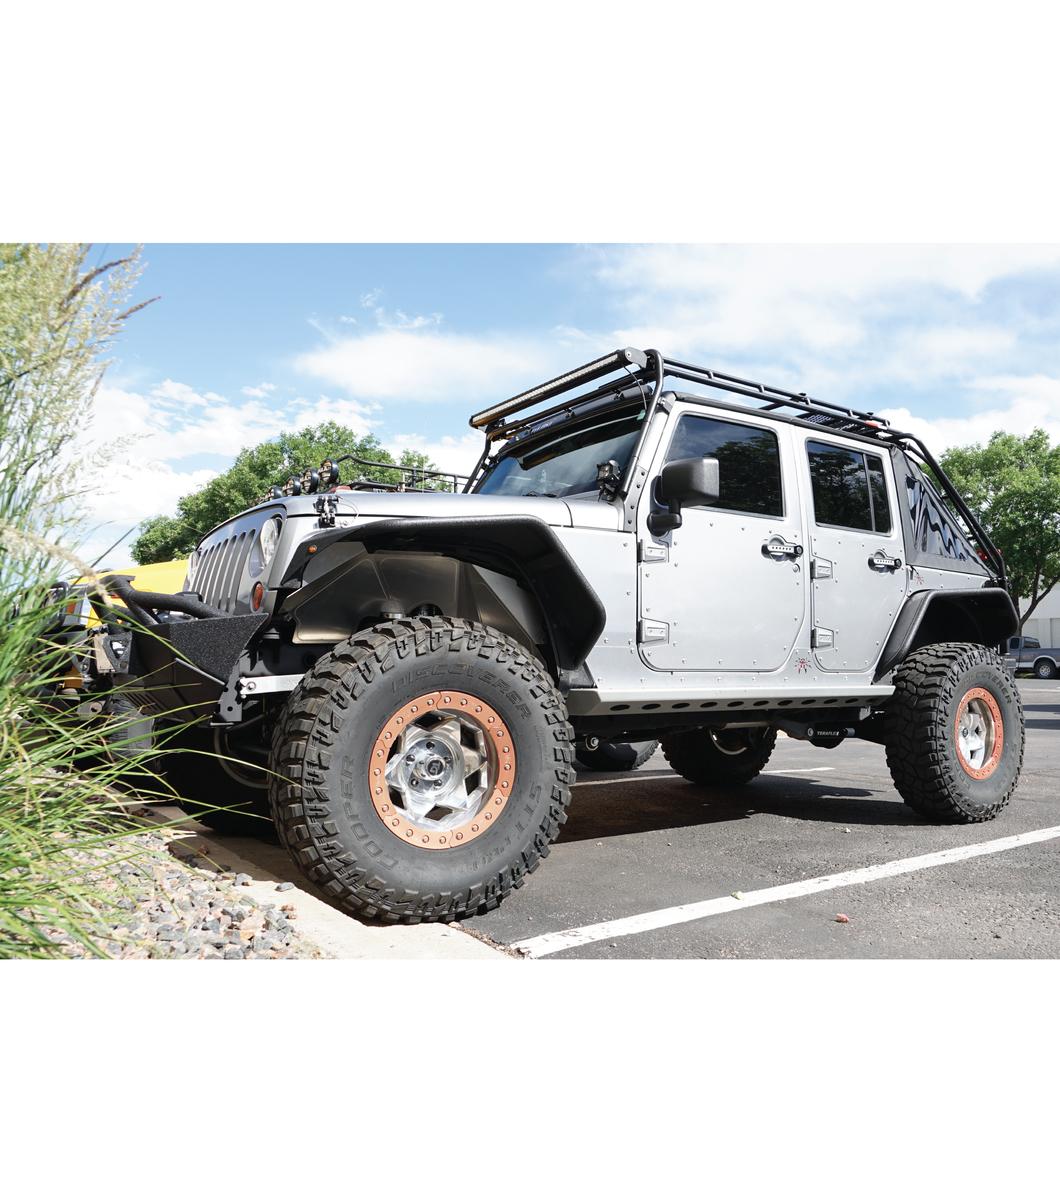 Jeep Jk45 4door 183 Stealth Rack 183 Lightbar Setup Gobi Racks